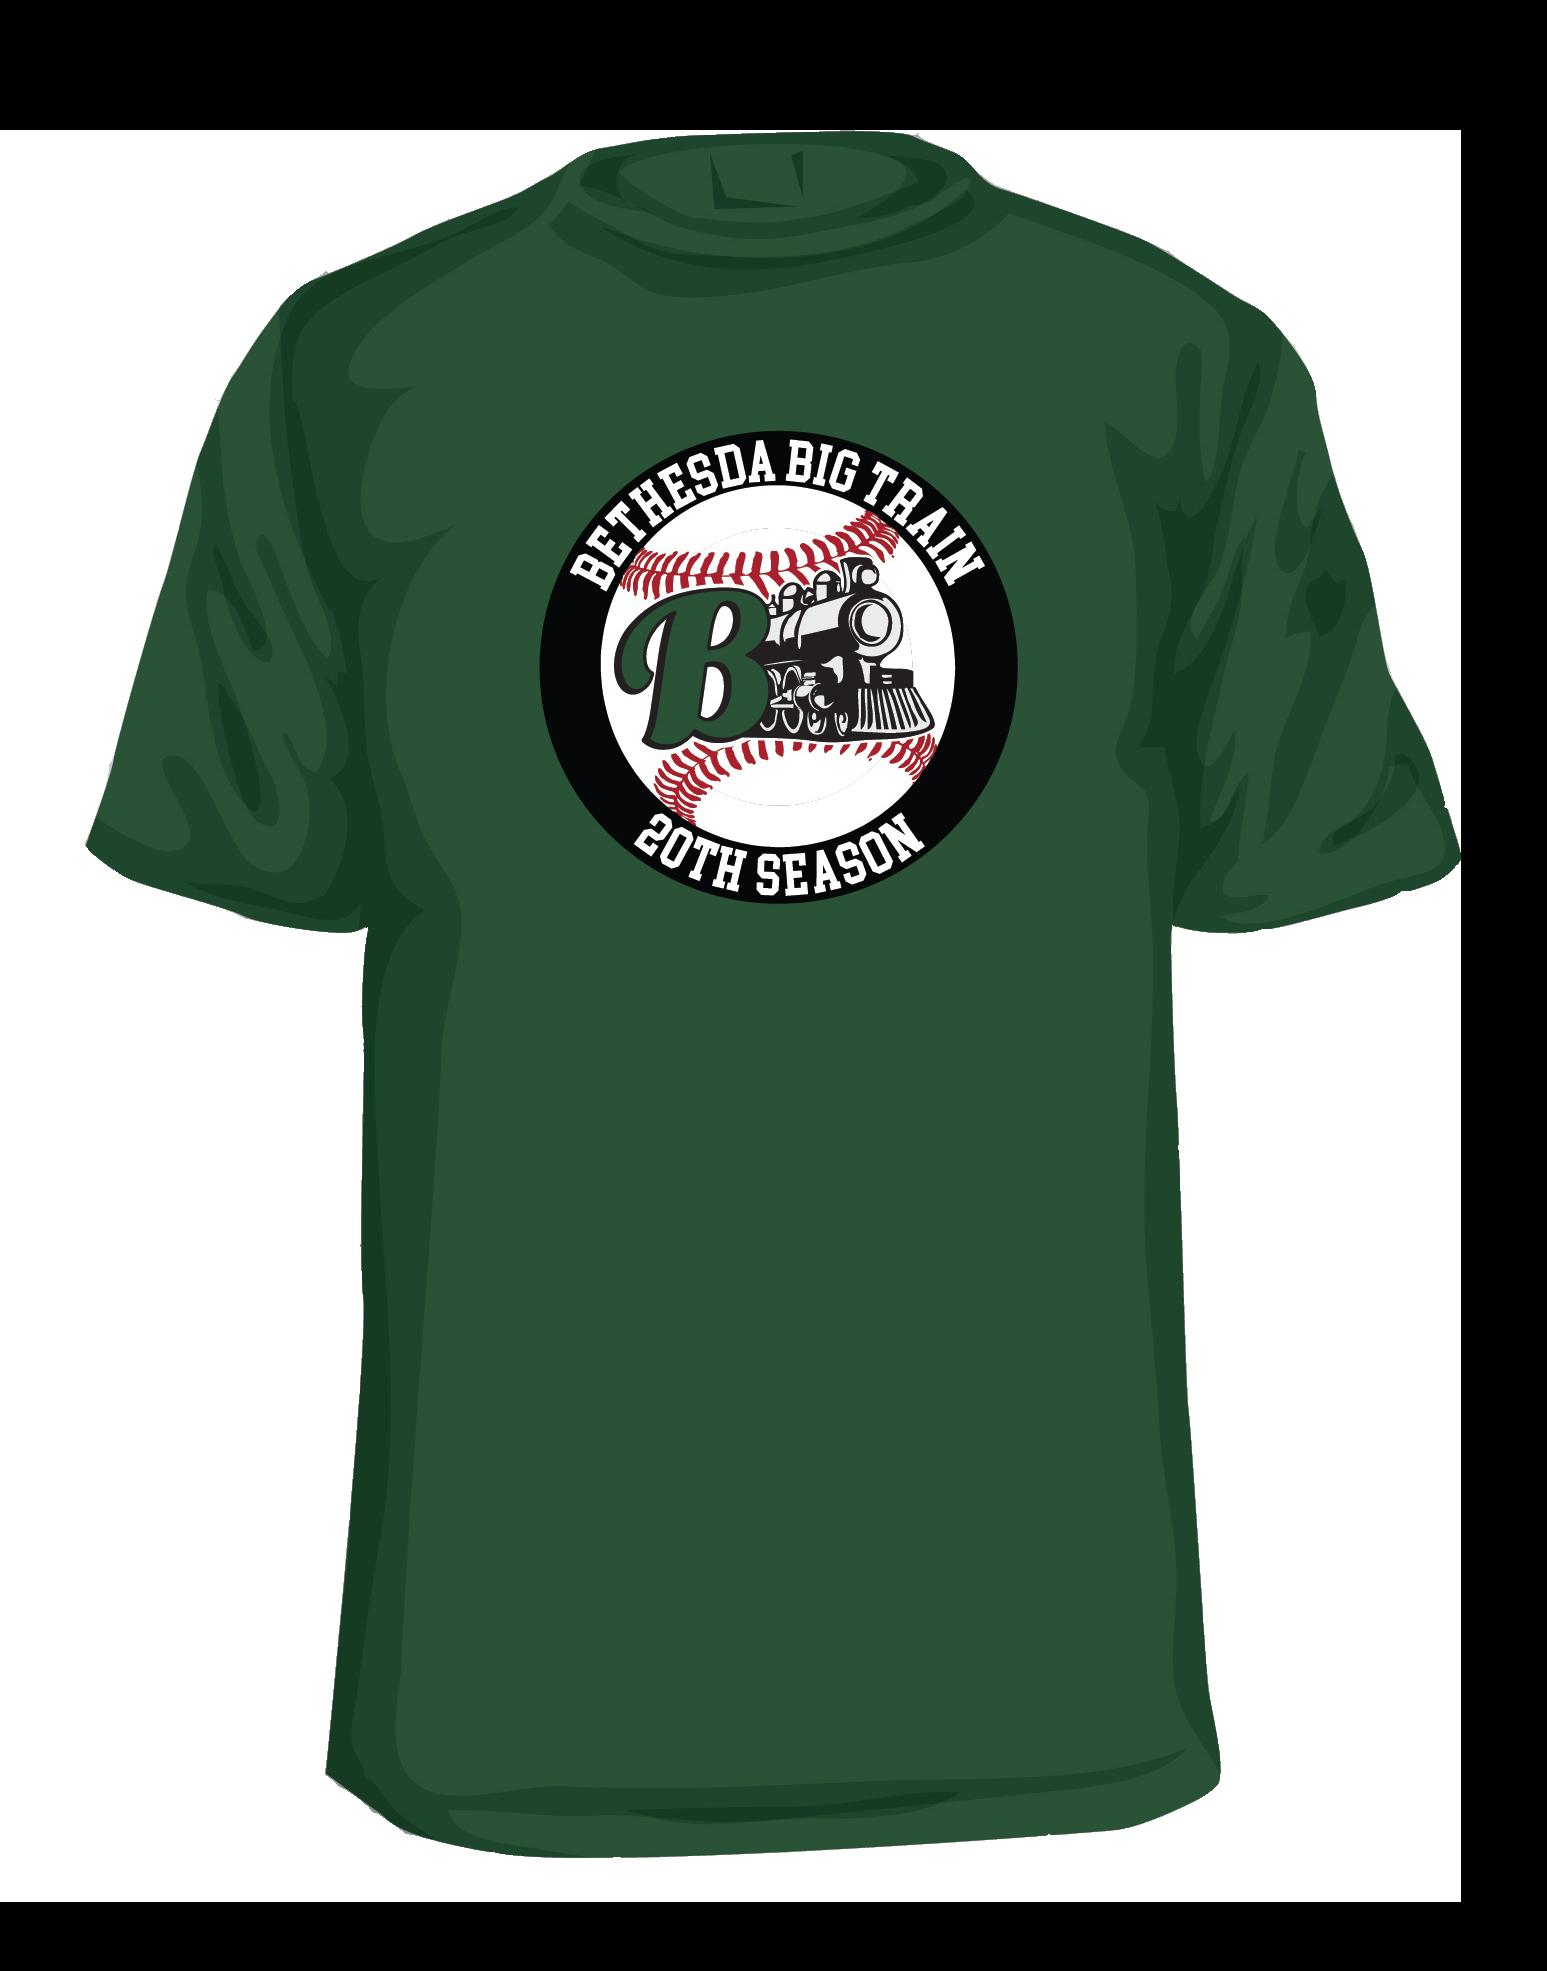 20th Season Shirt